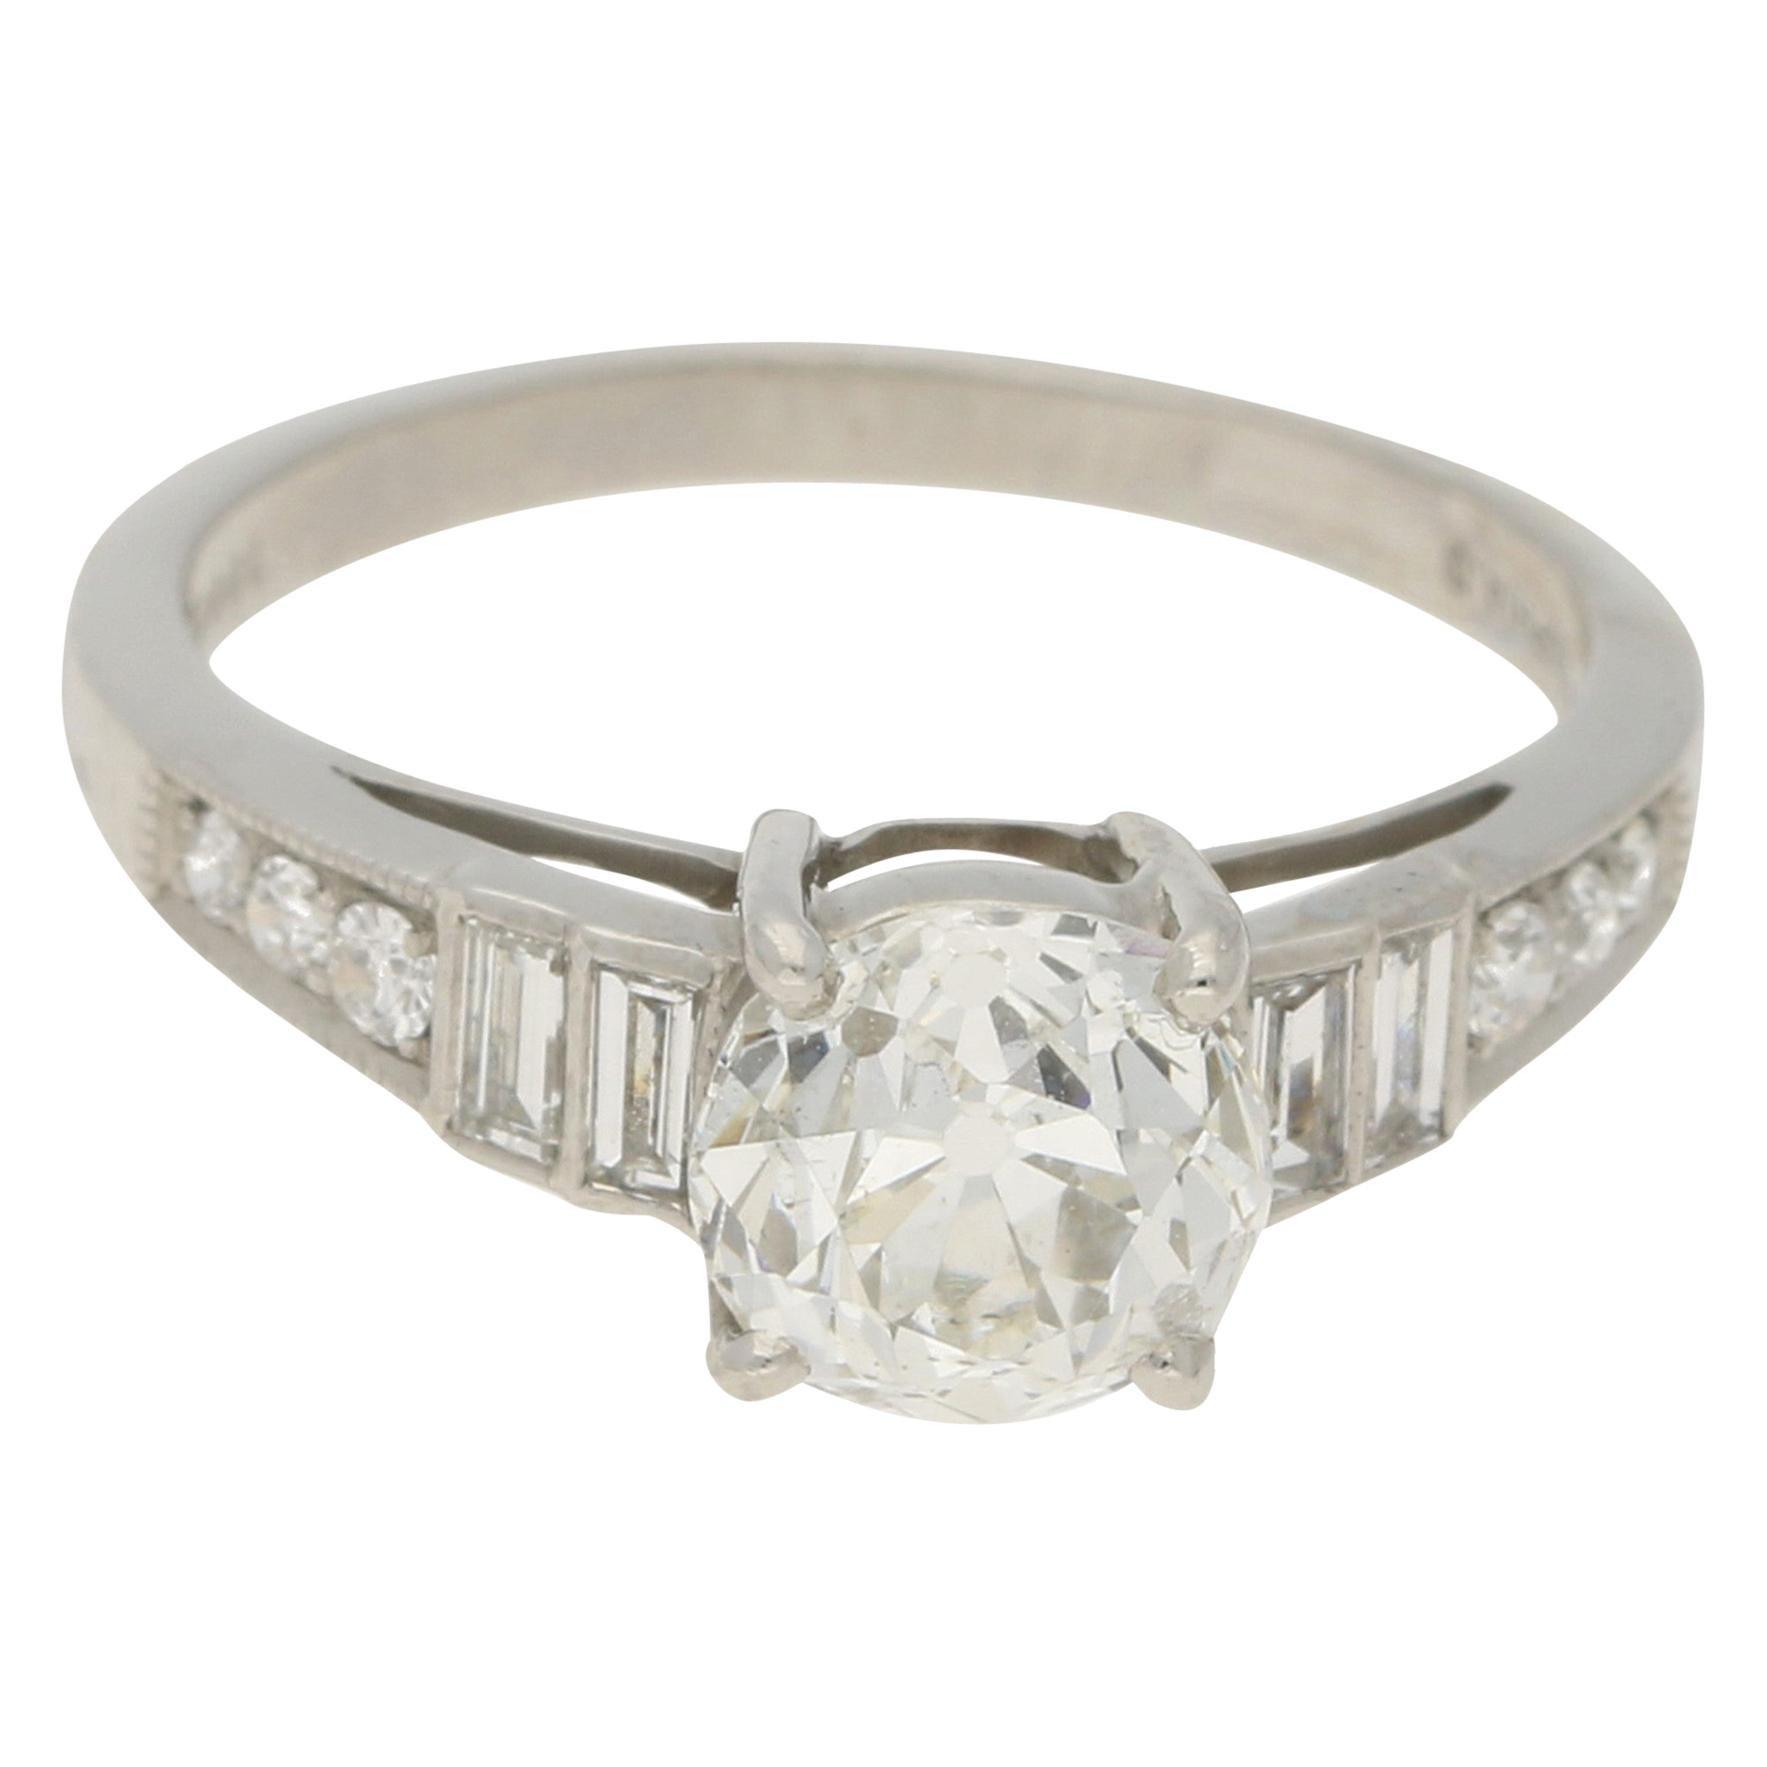 Old European Cut Diamond Engagement Ring Set in Platinum